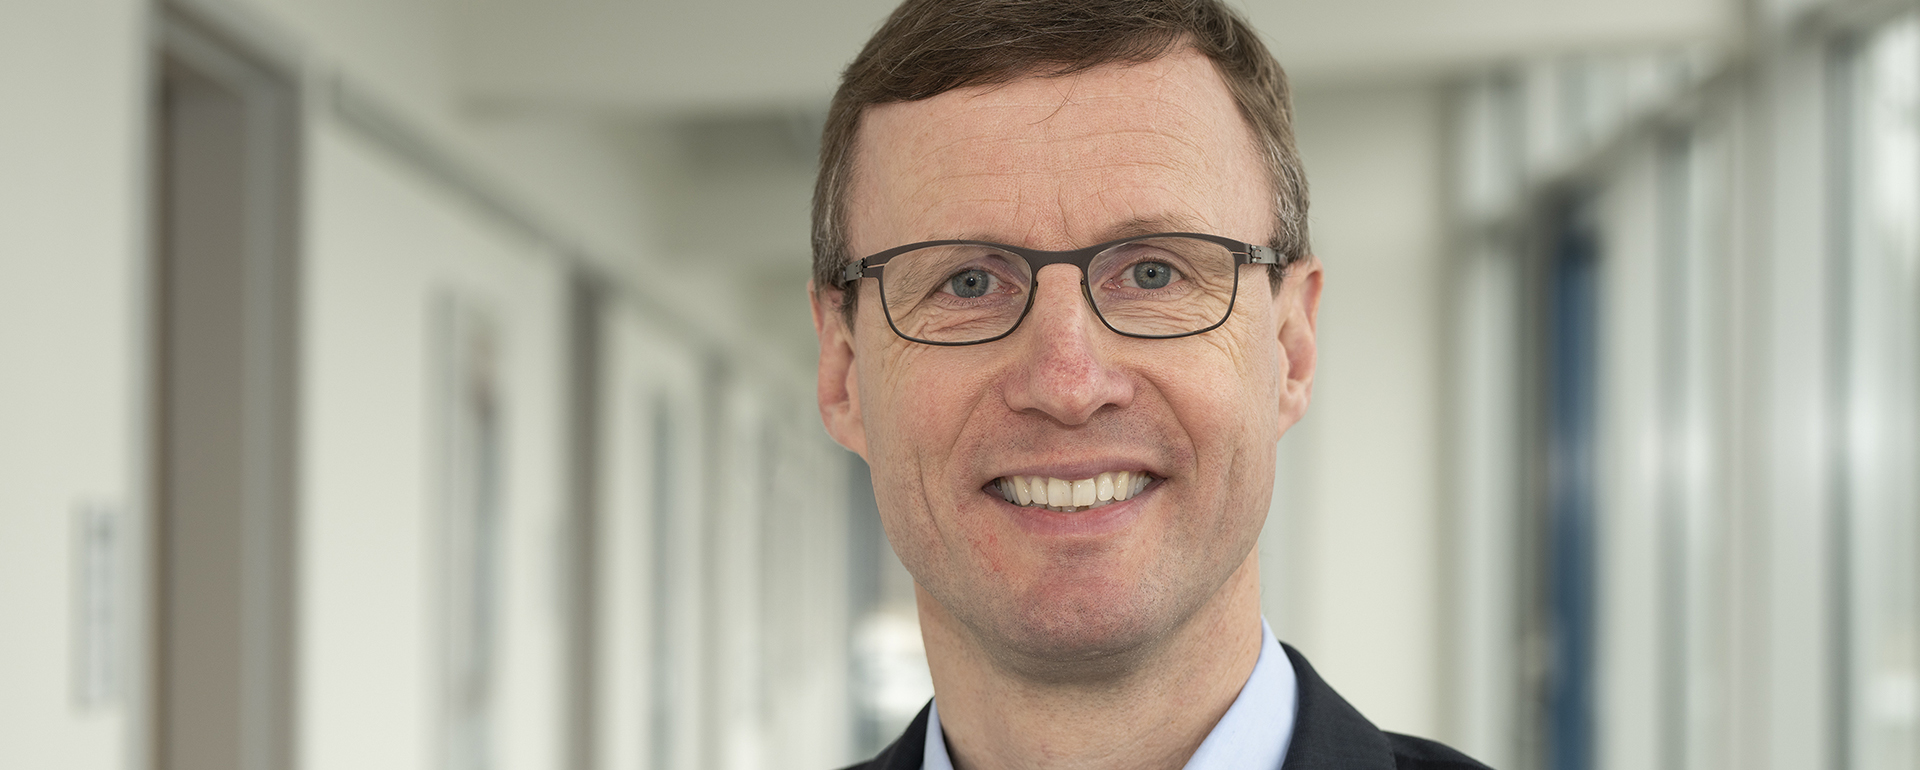 Prof. Janbernd Kirschner etabliert die Neuropädiatrie am Universitätsklinikum Bonn